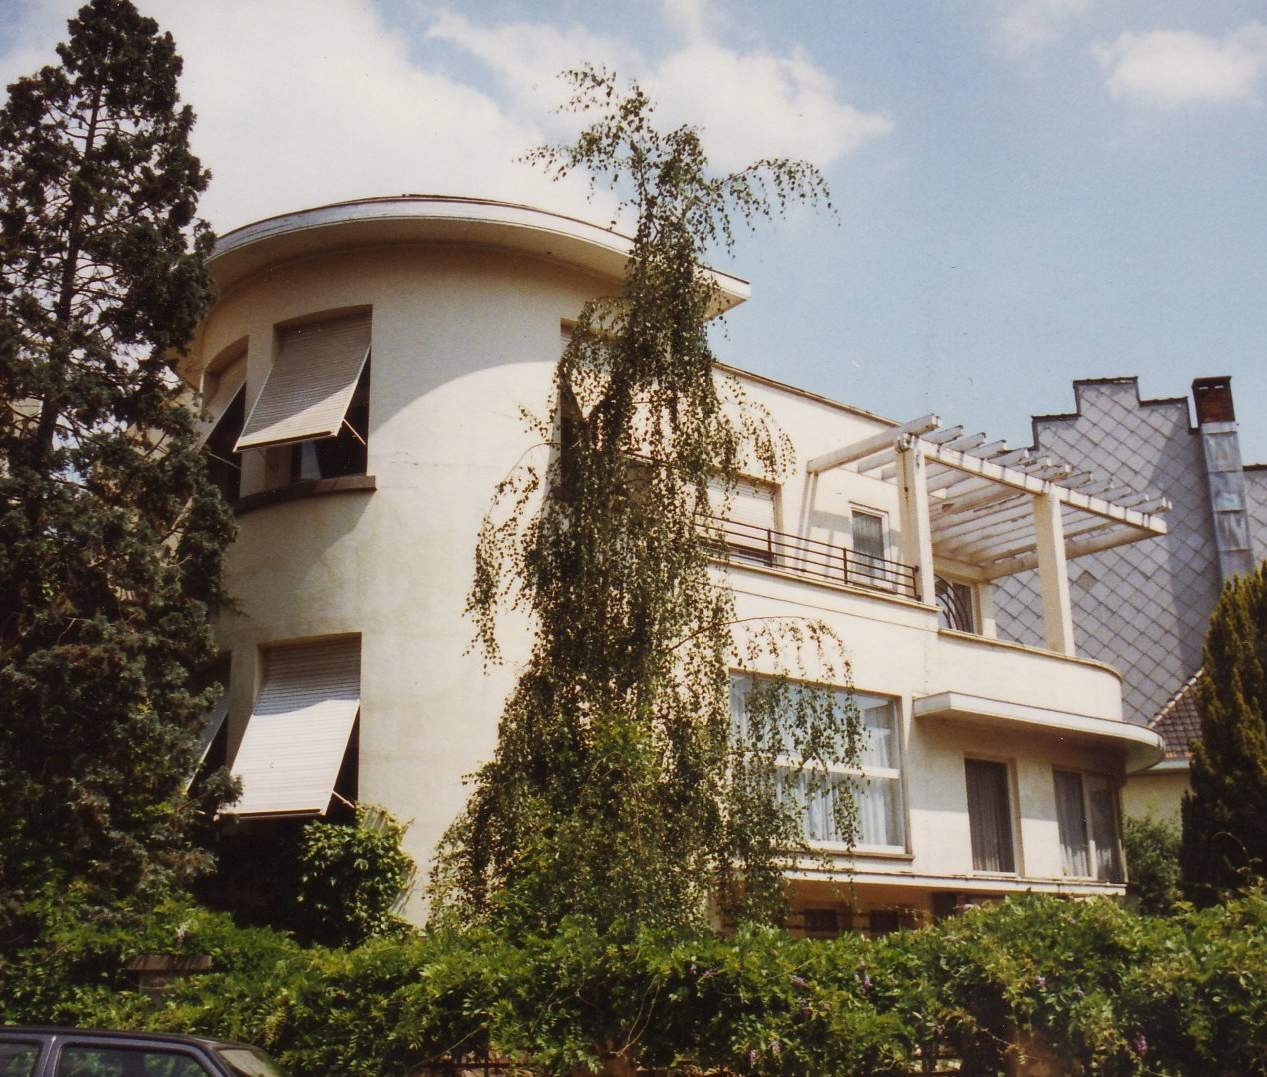 Rue de la Duchesse 2., 1994